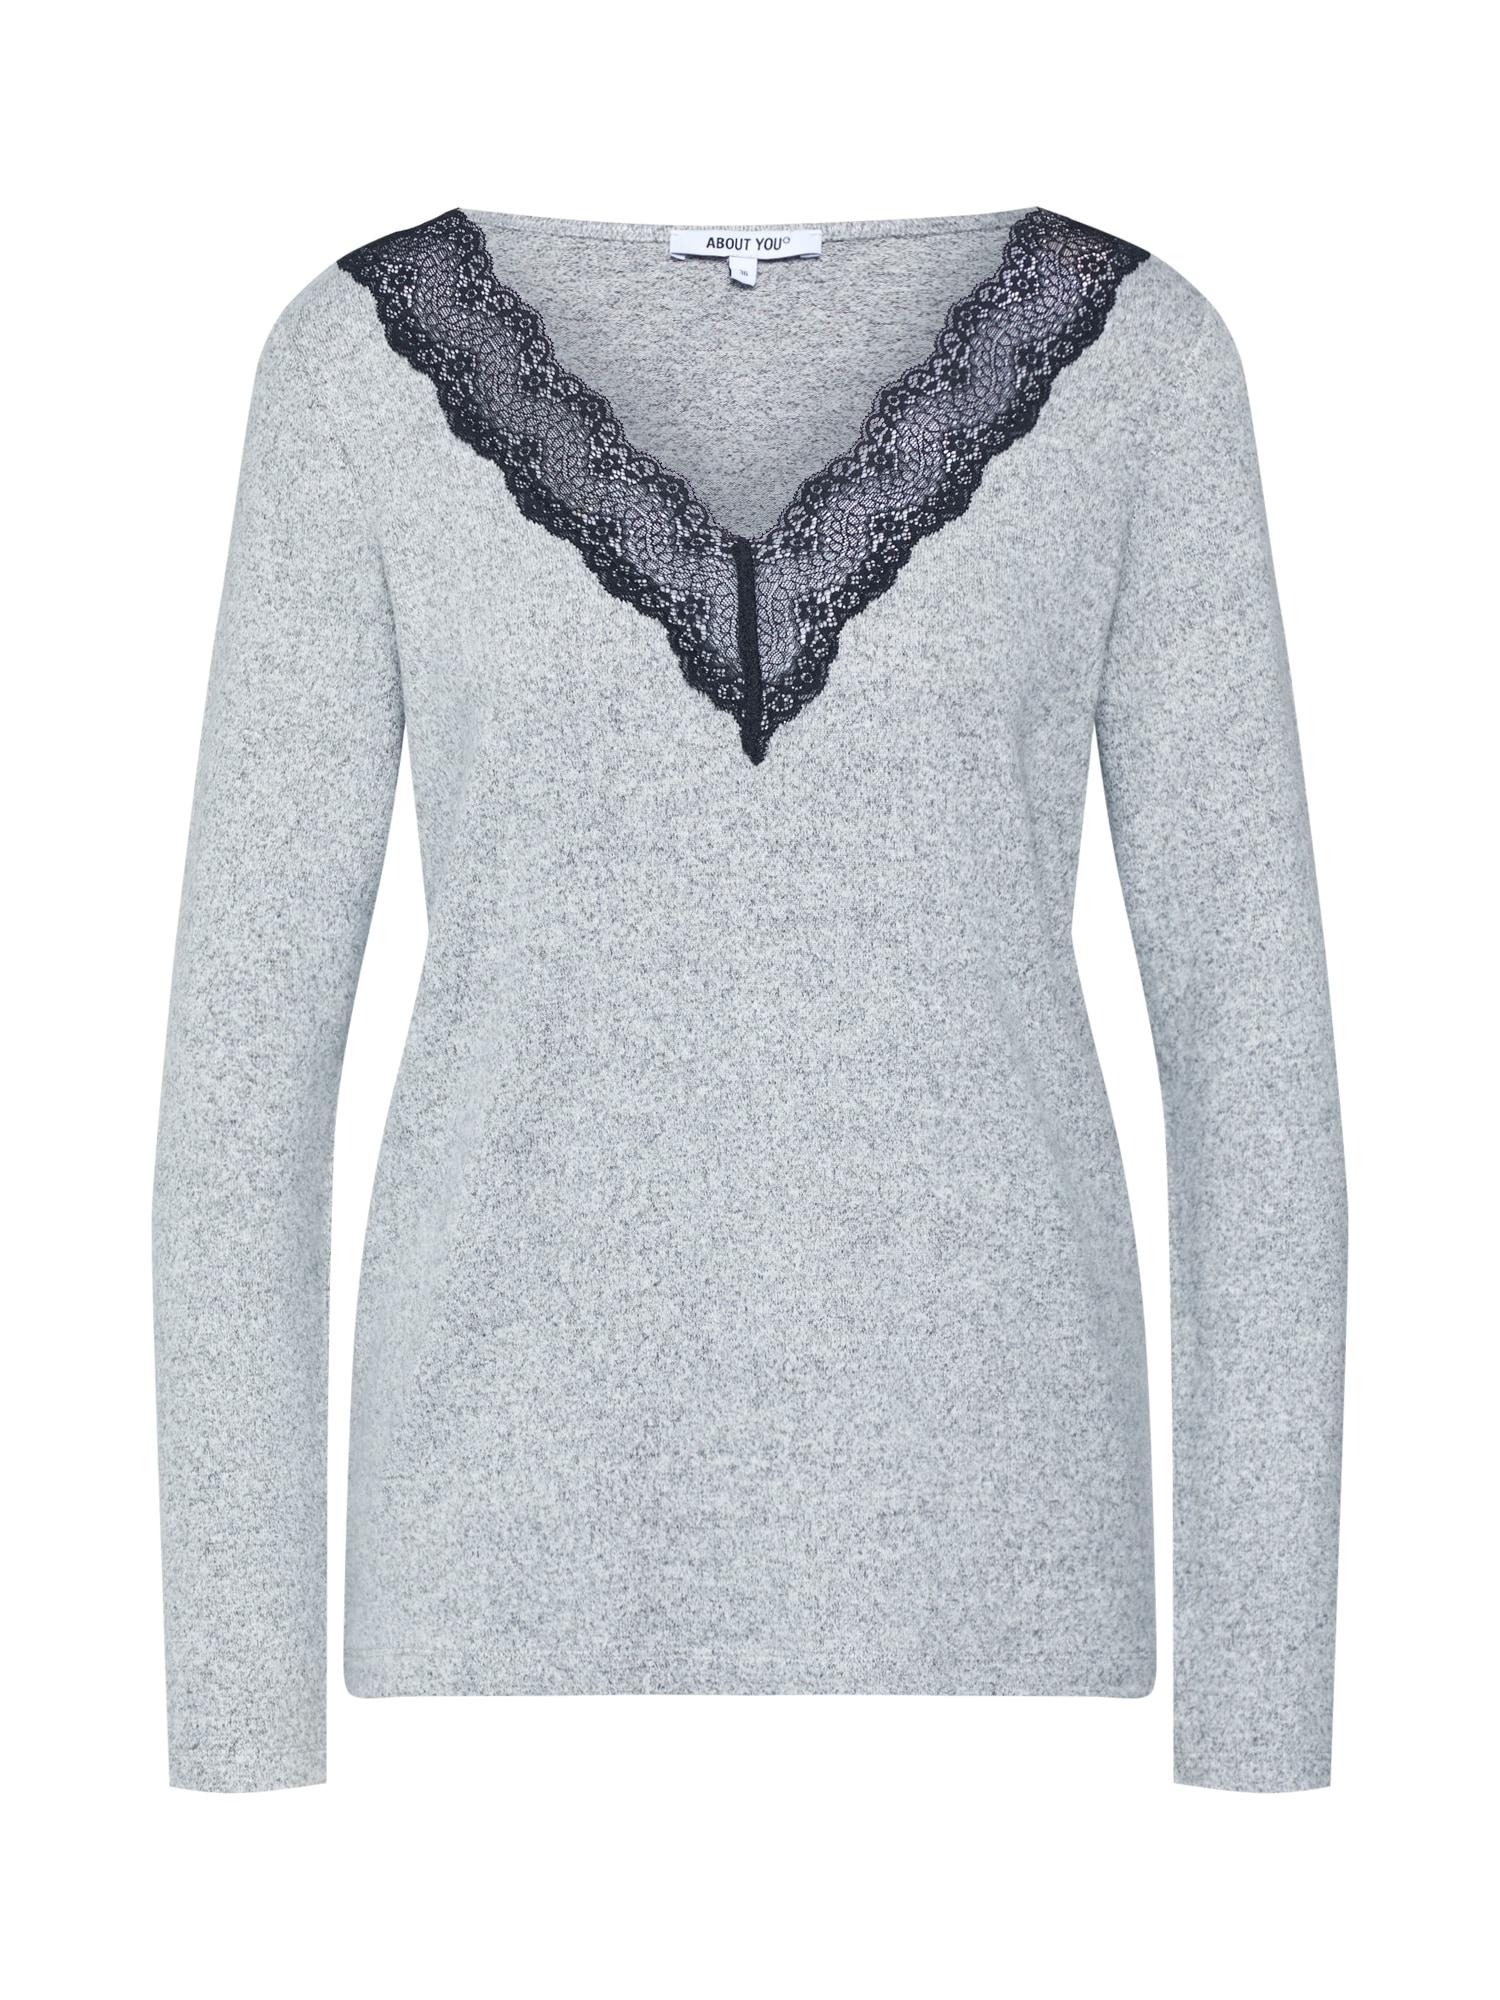 ABOUT YOU Megztinis 'Gabriele' margai pilka